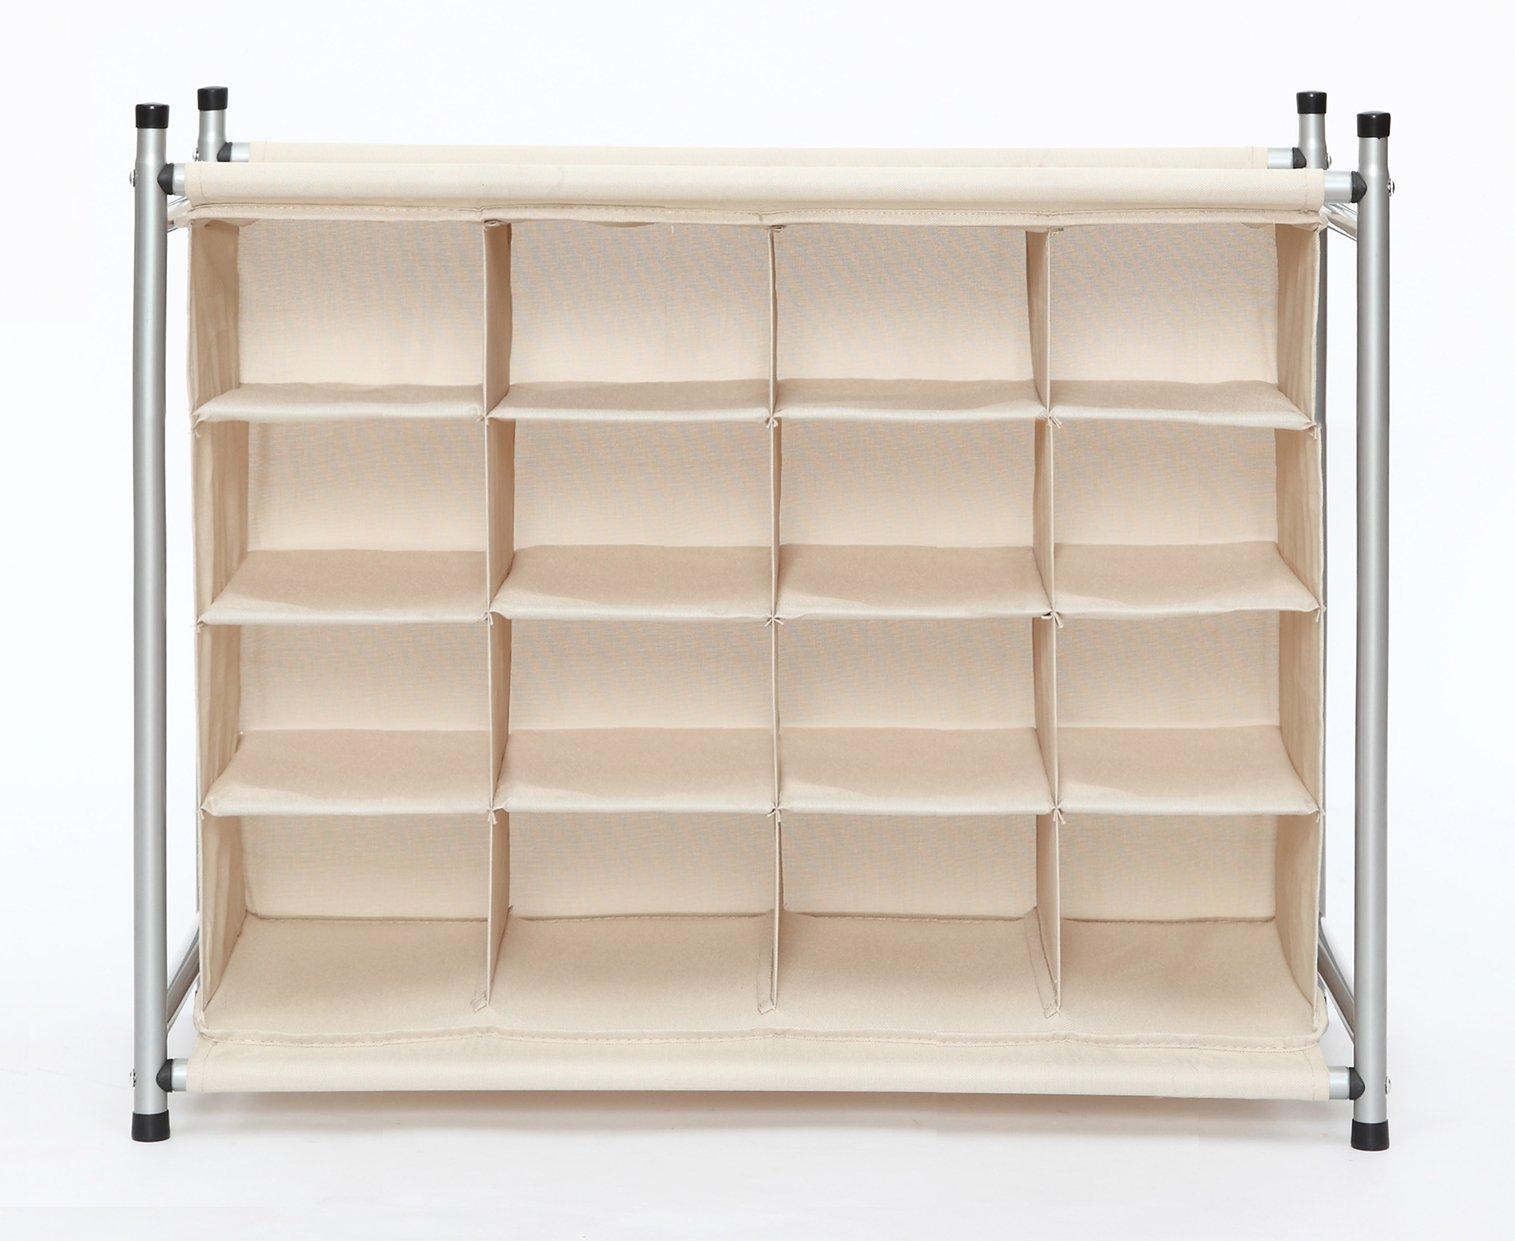 STORAGE MANIAC 4-Tier 16-Cube Stackable Shoe Rack Organizer, Free Standing Shoe Storage Cubby, Beige